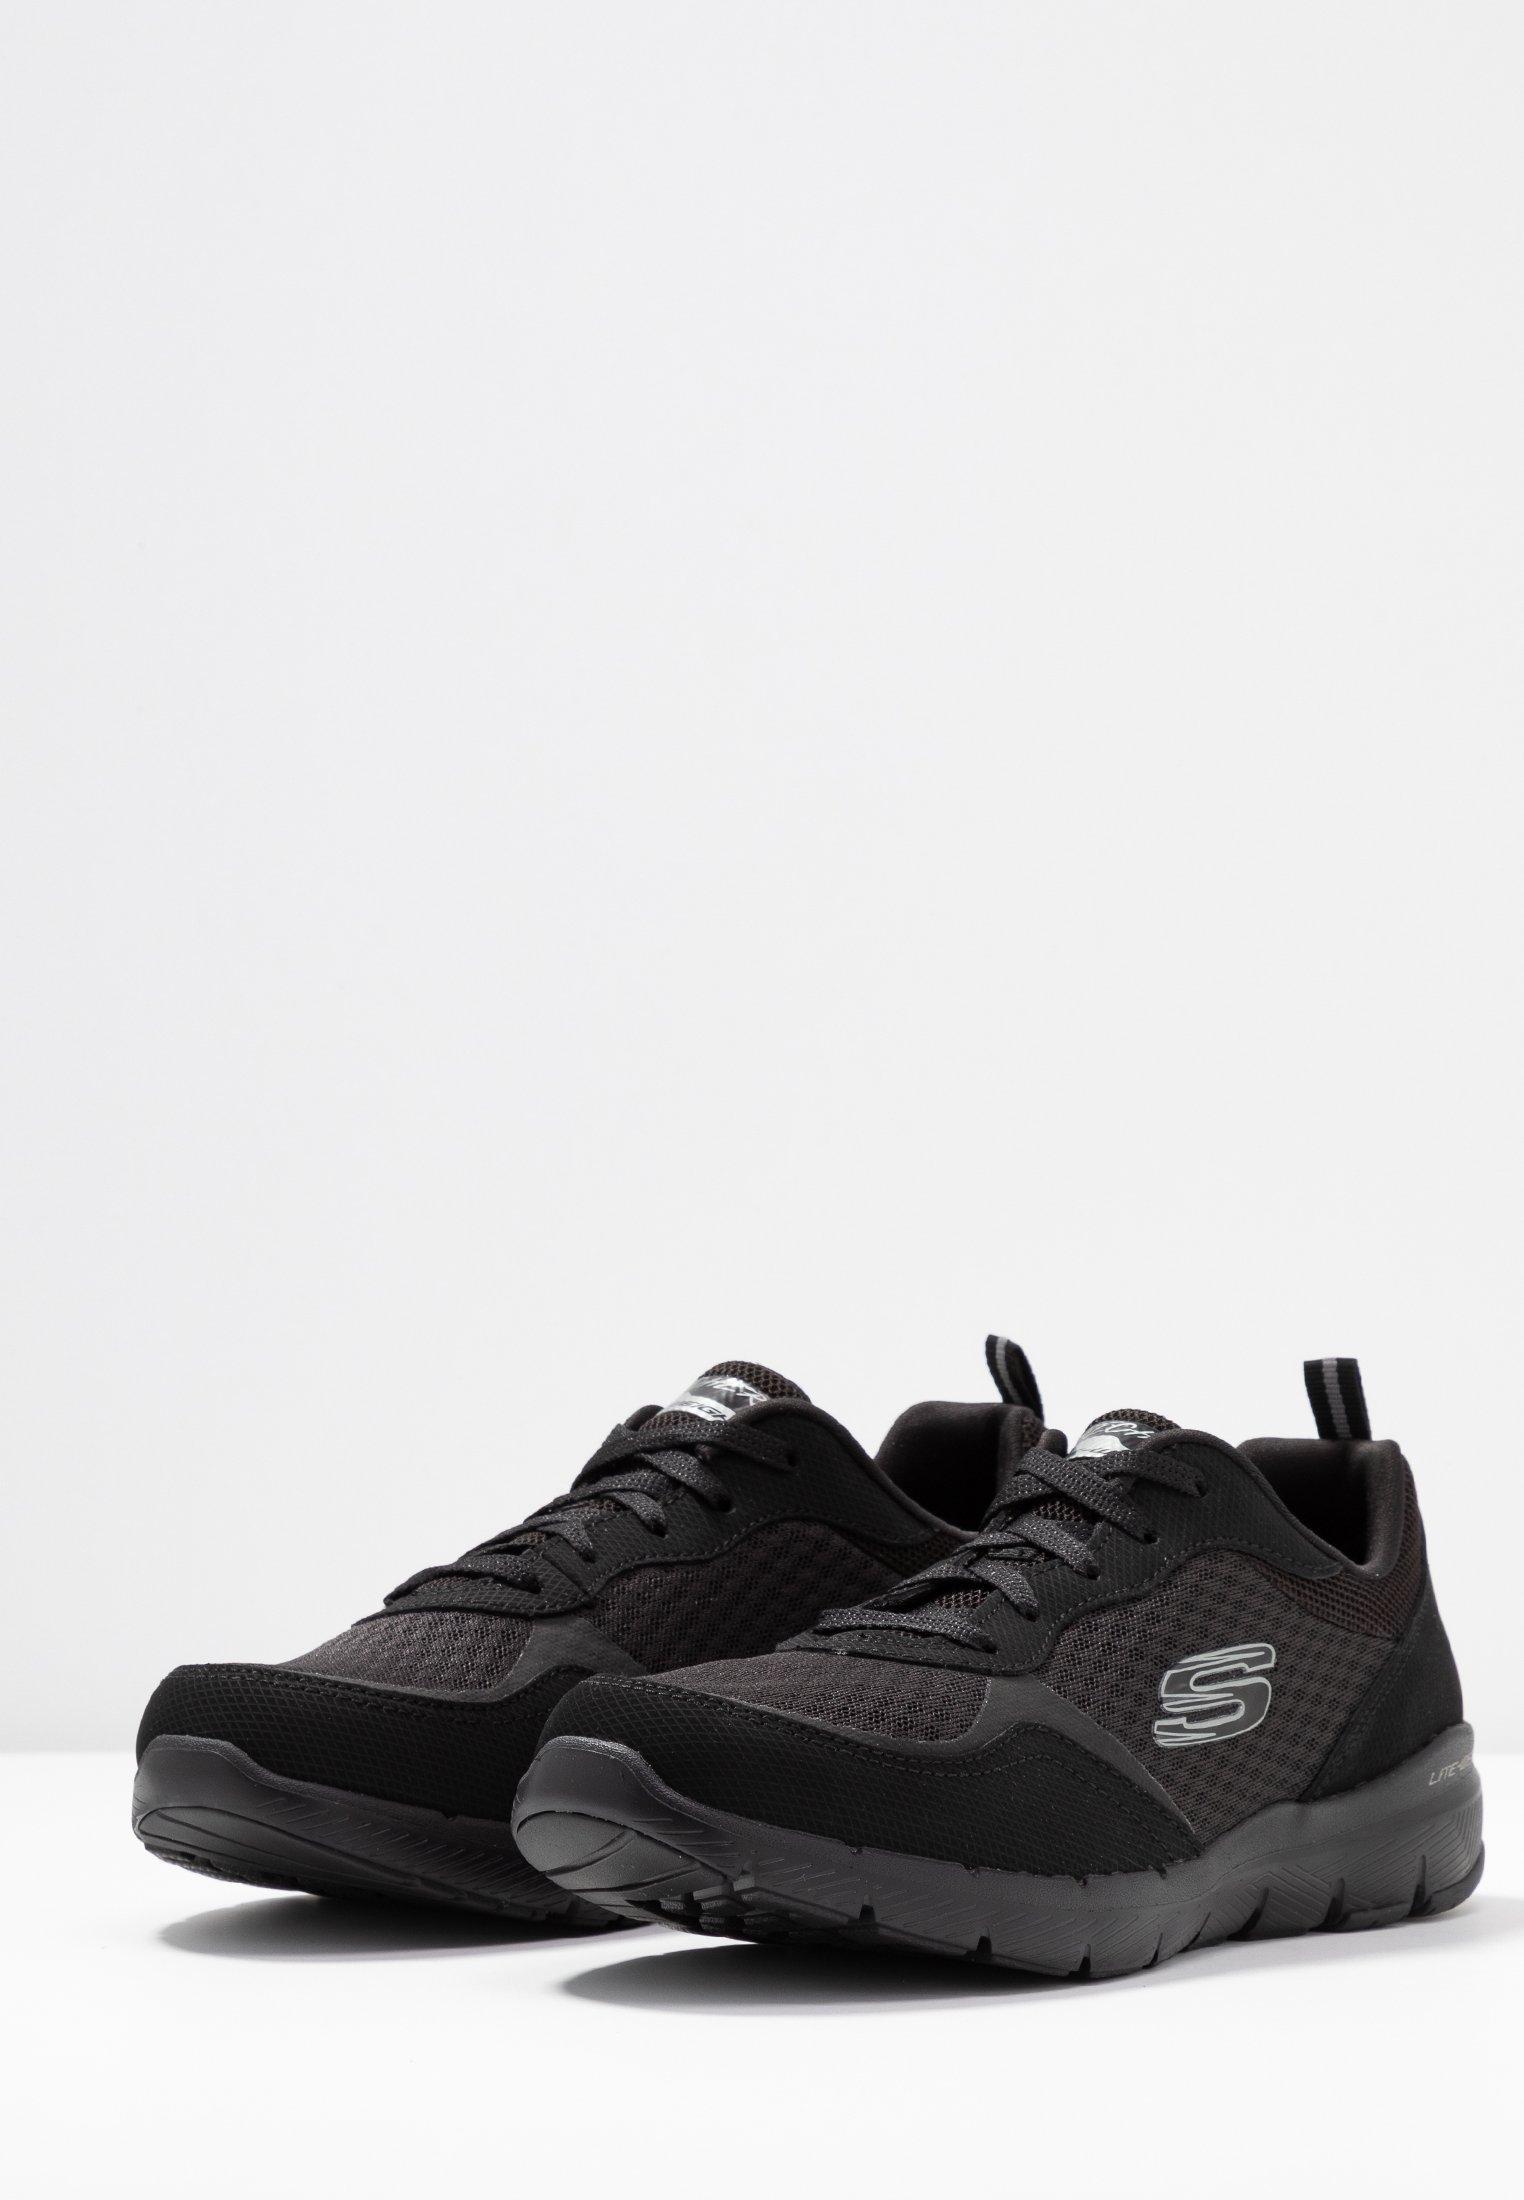 FLEX APPEAL 3.0 Sneakers black